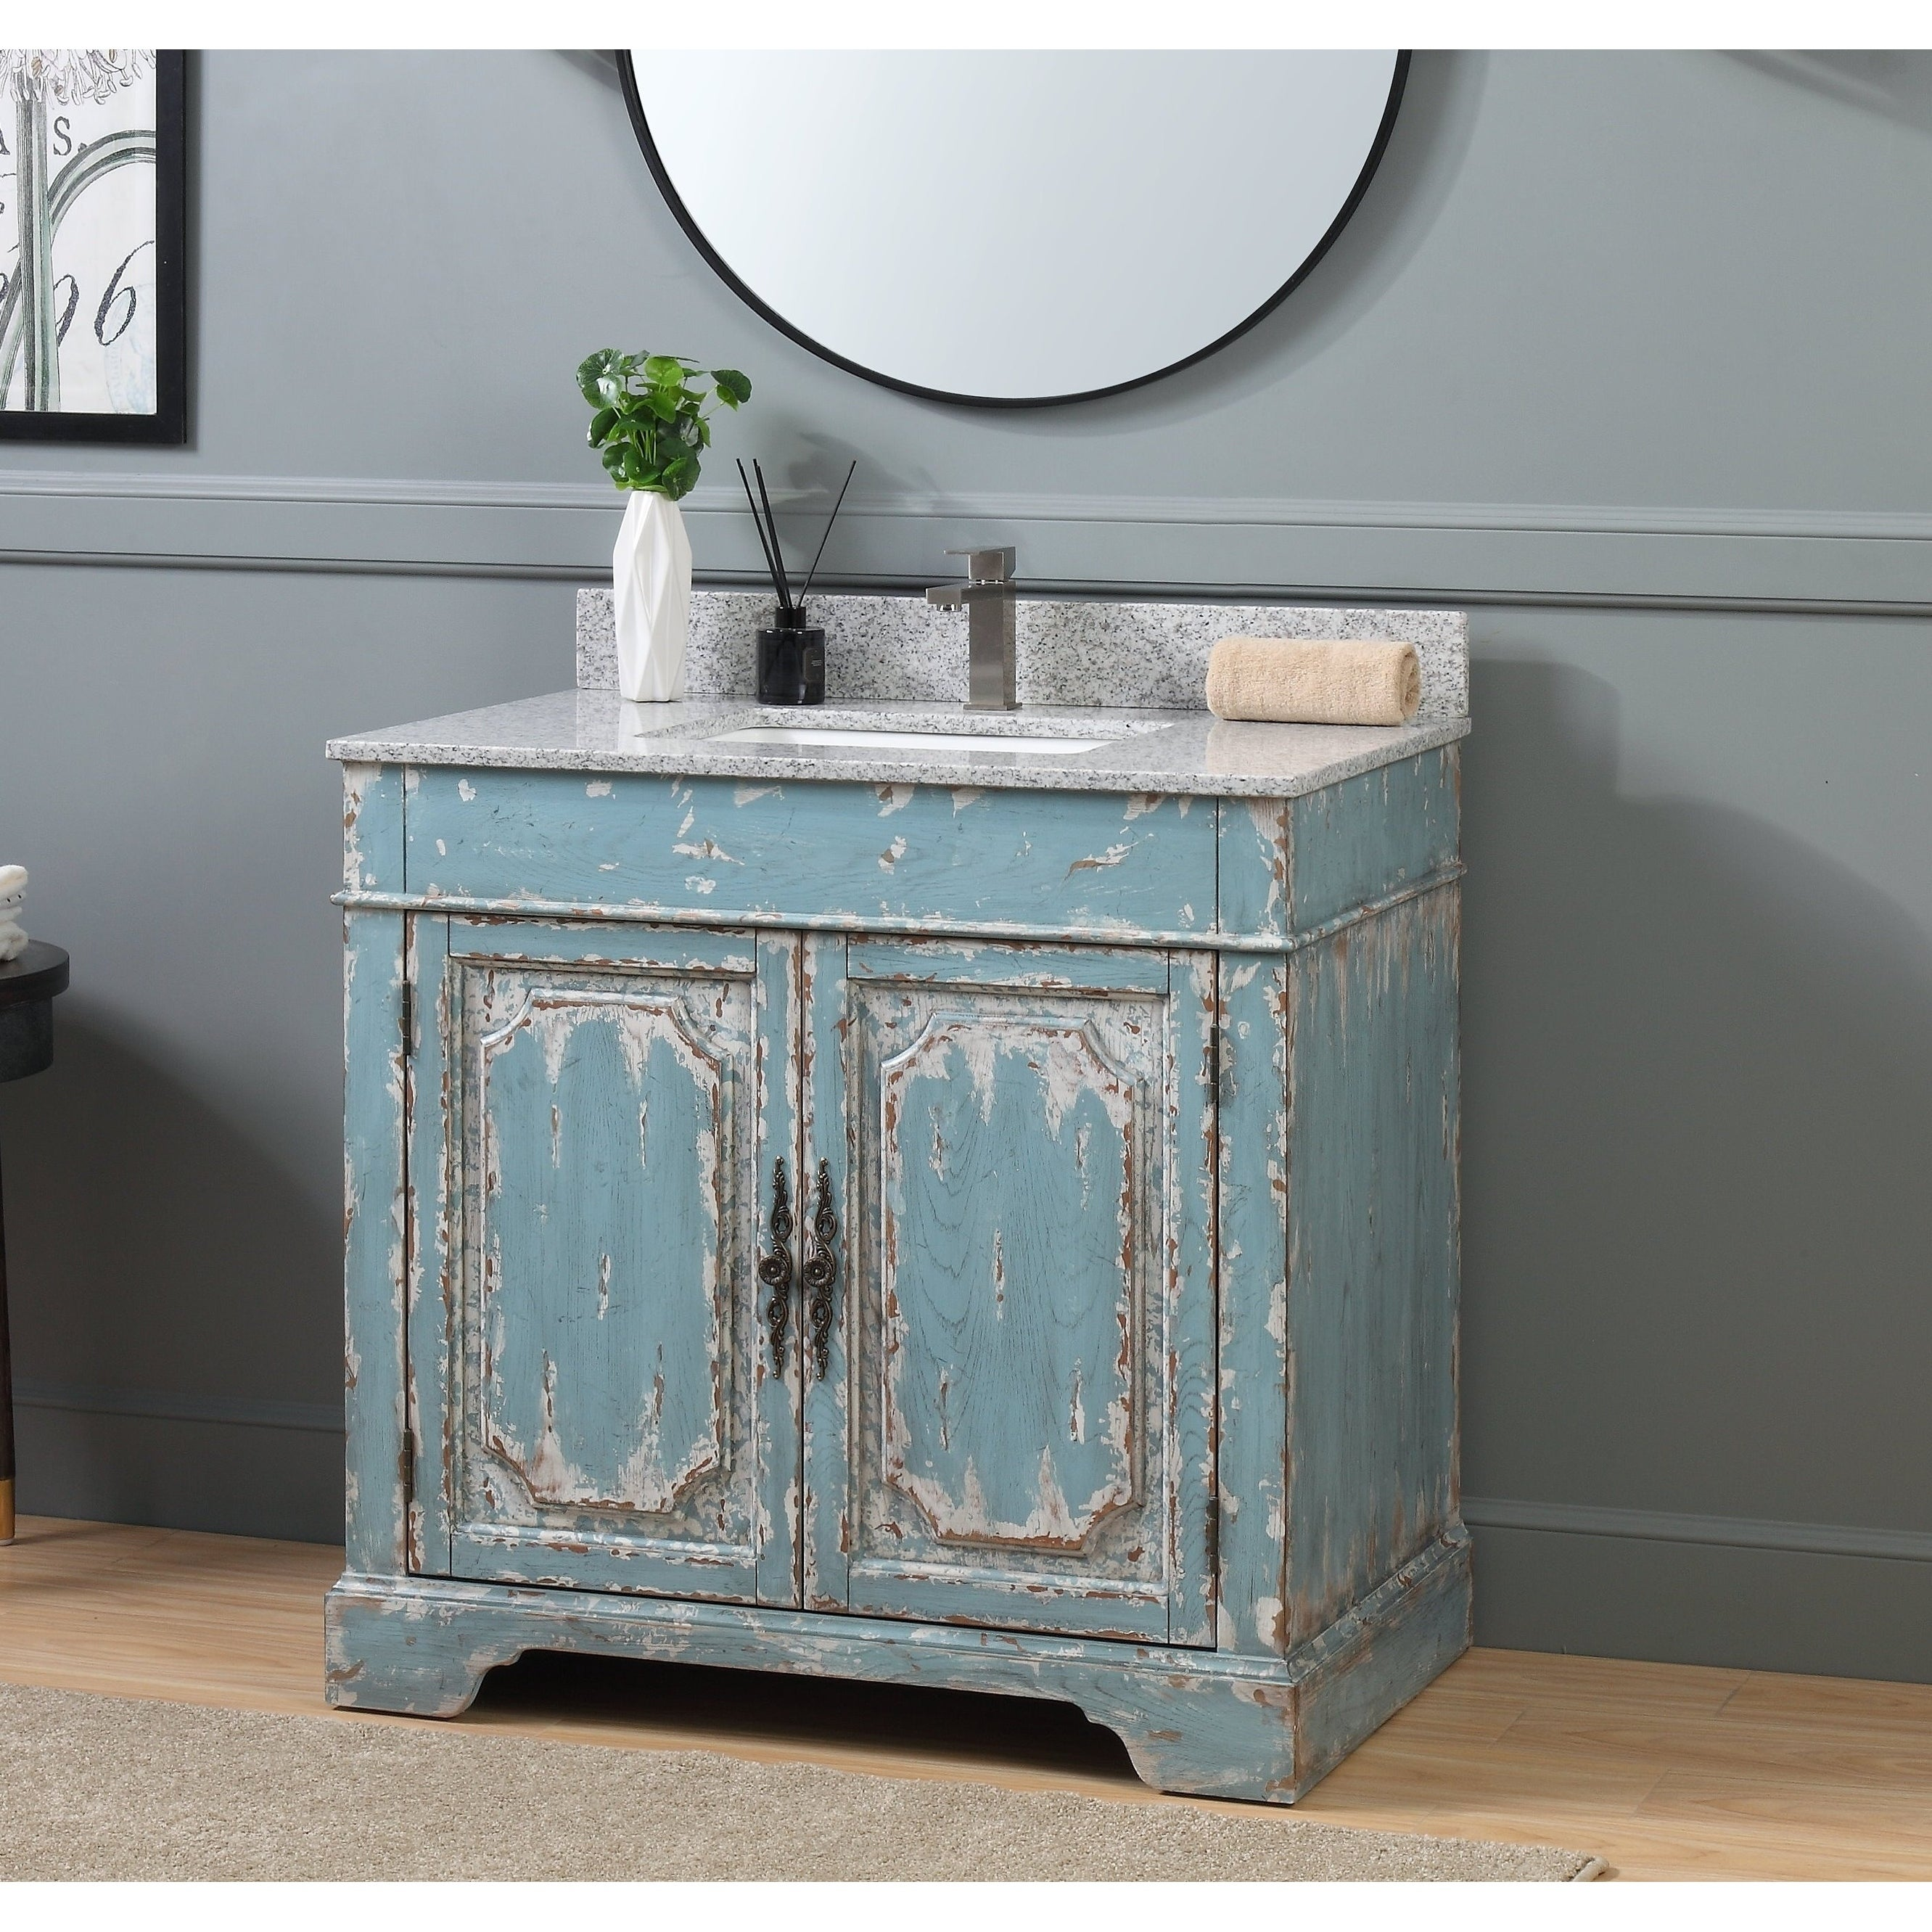 36 Benton Collection Litchfield Rustic Light Blue Bathroom Vanity On Sale Overstock 25982904